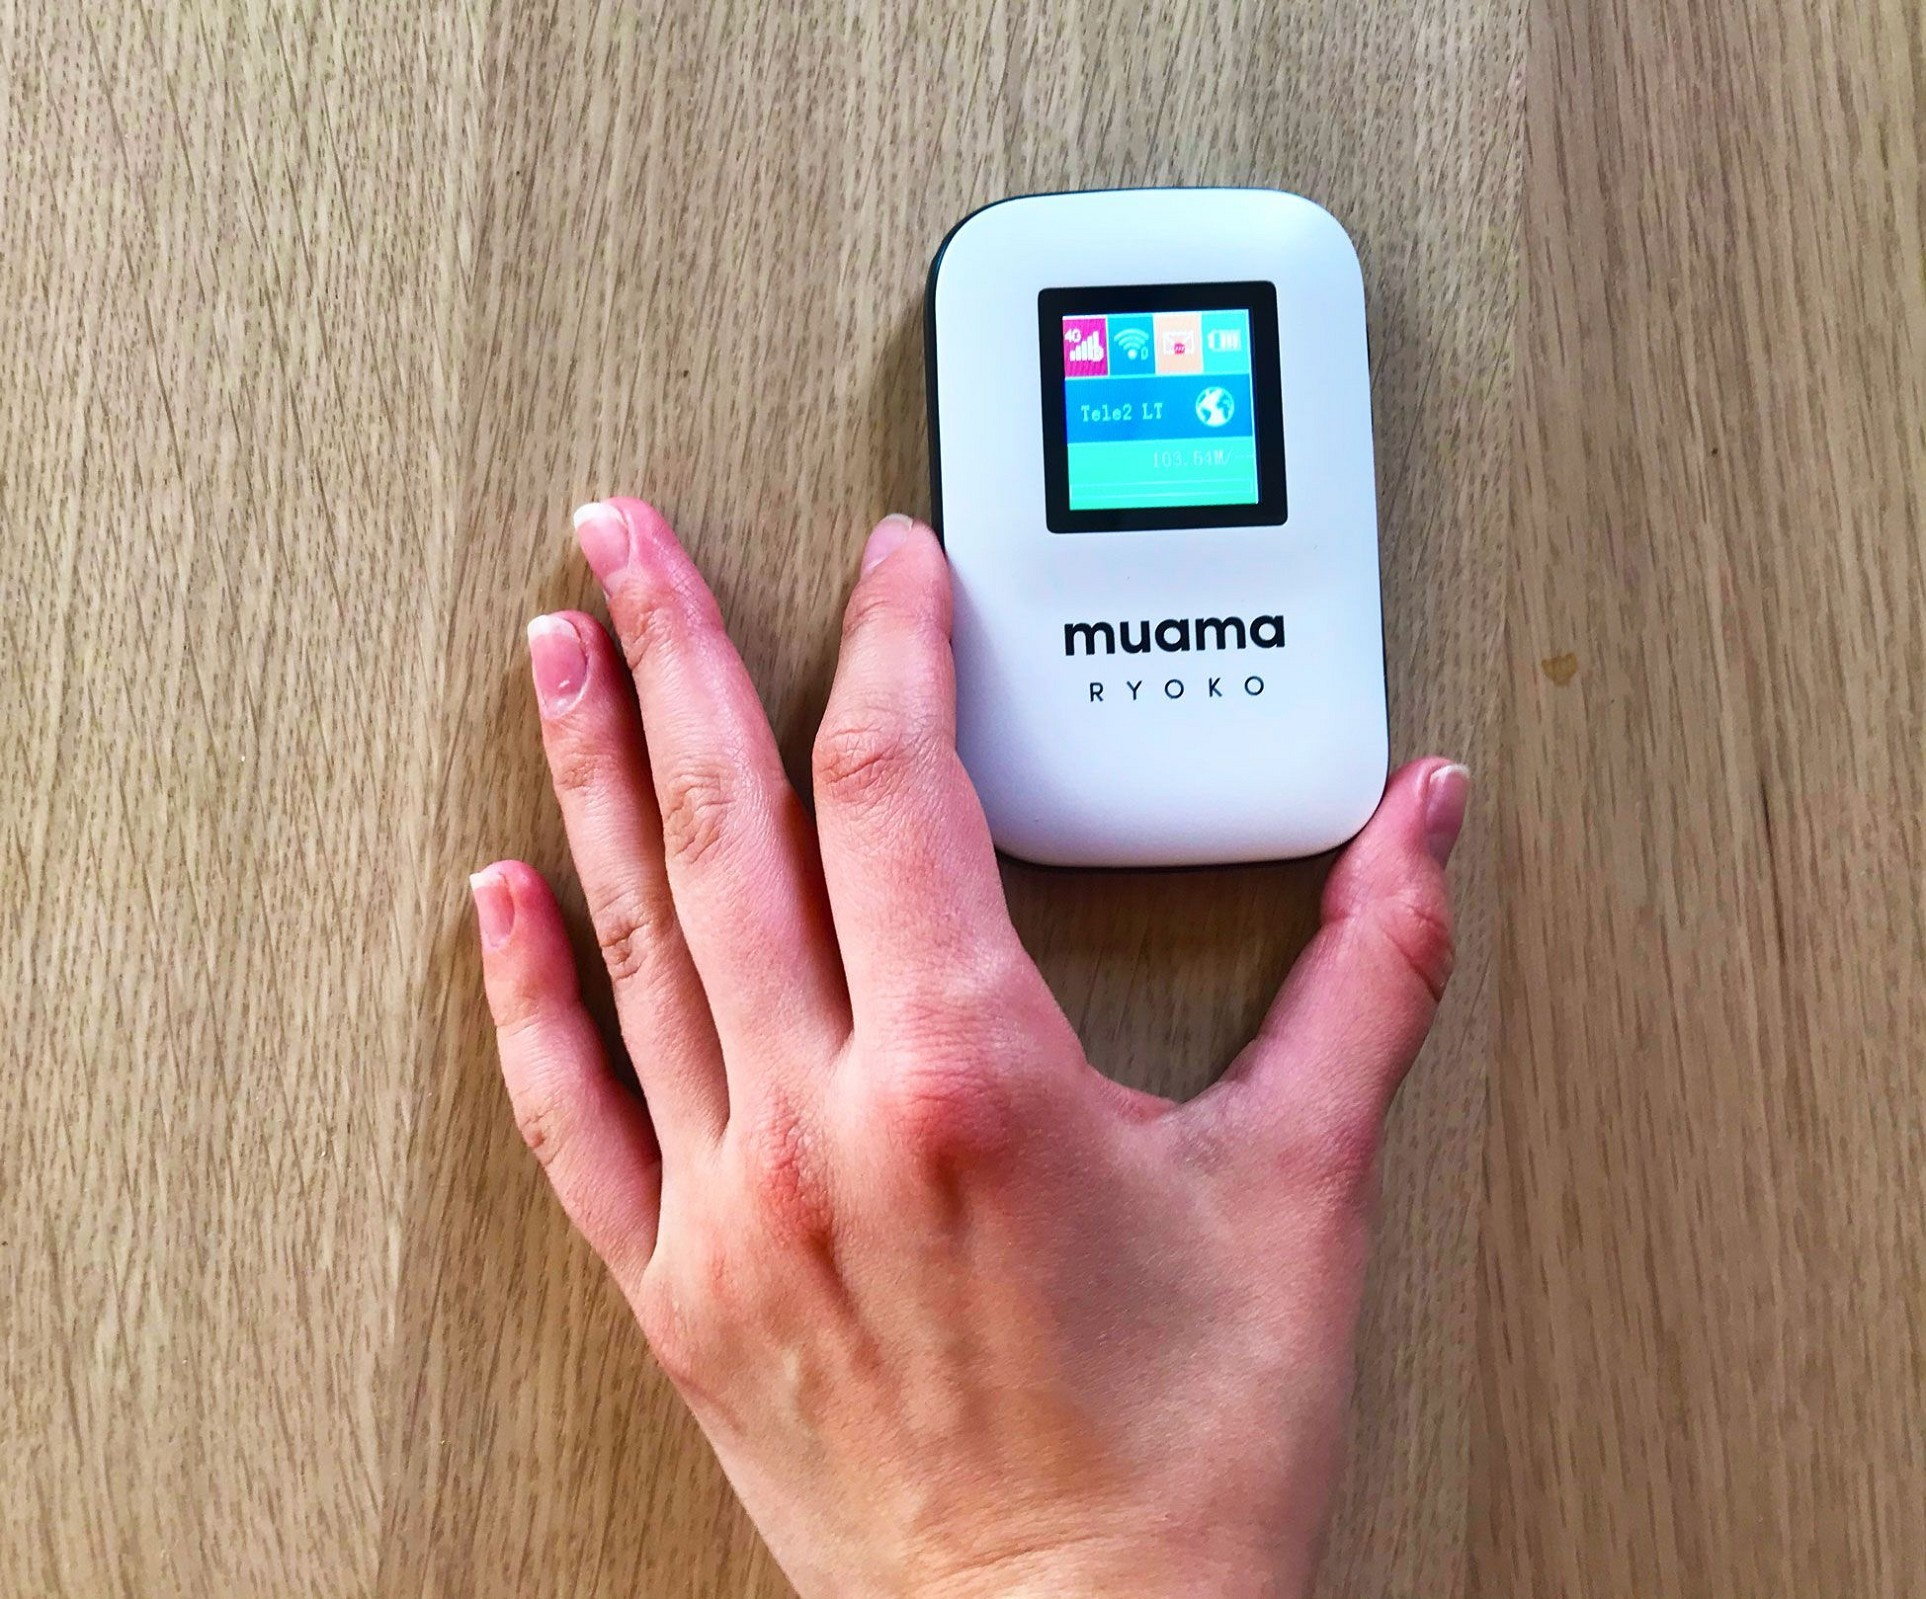 Muama Ryoko - Portable Wifi Router